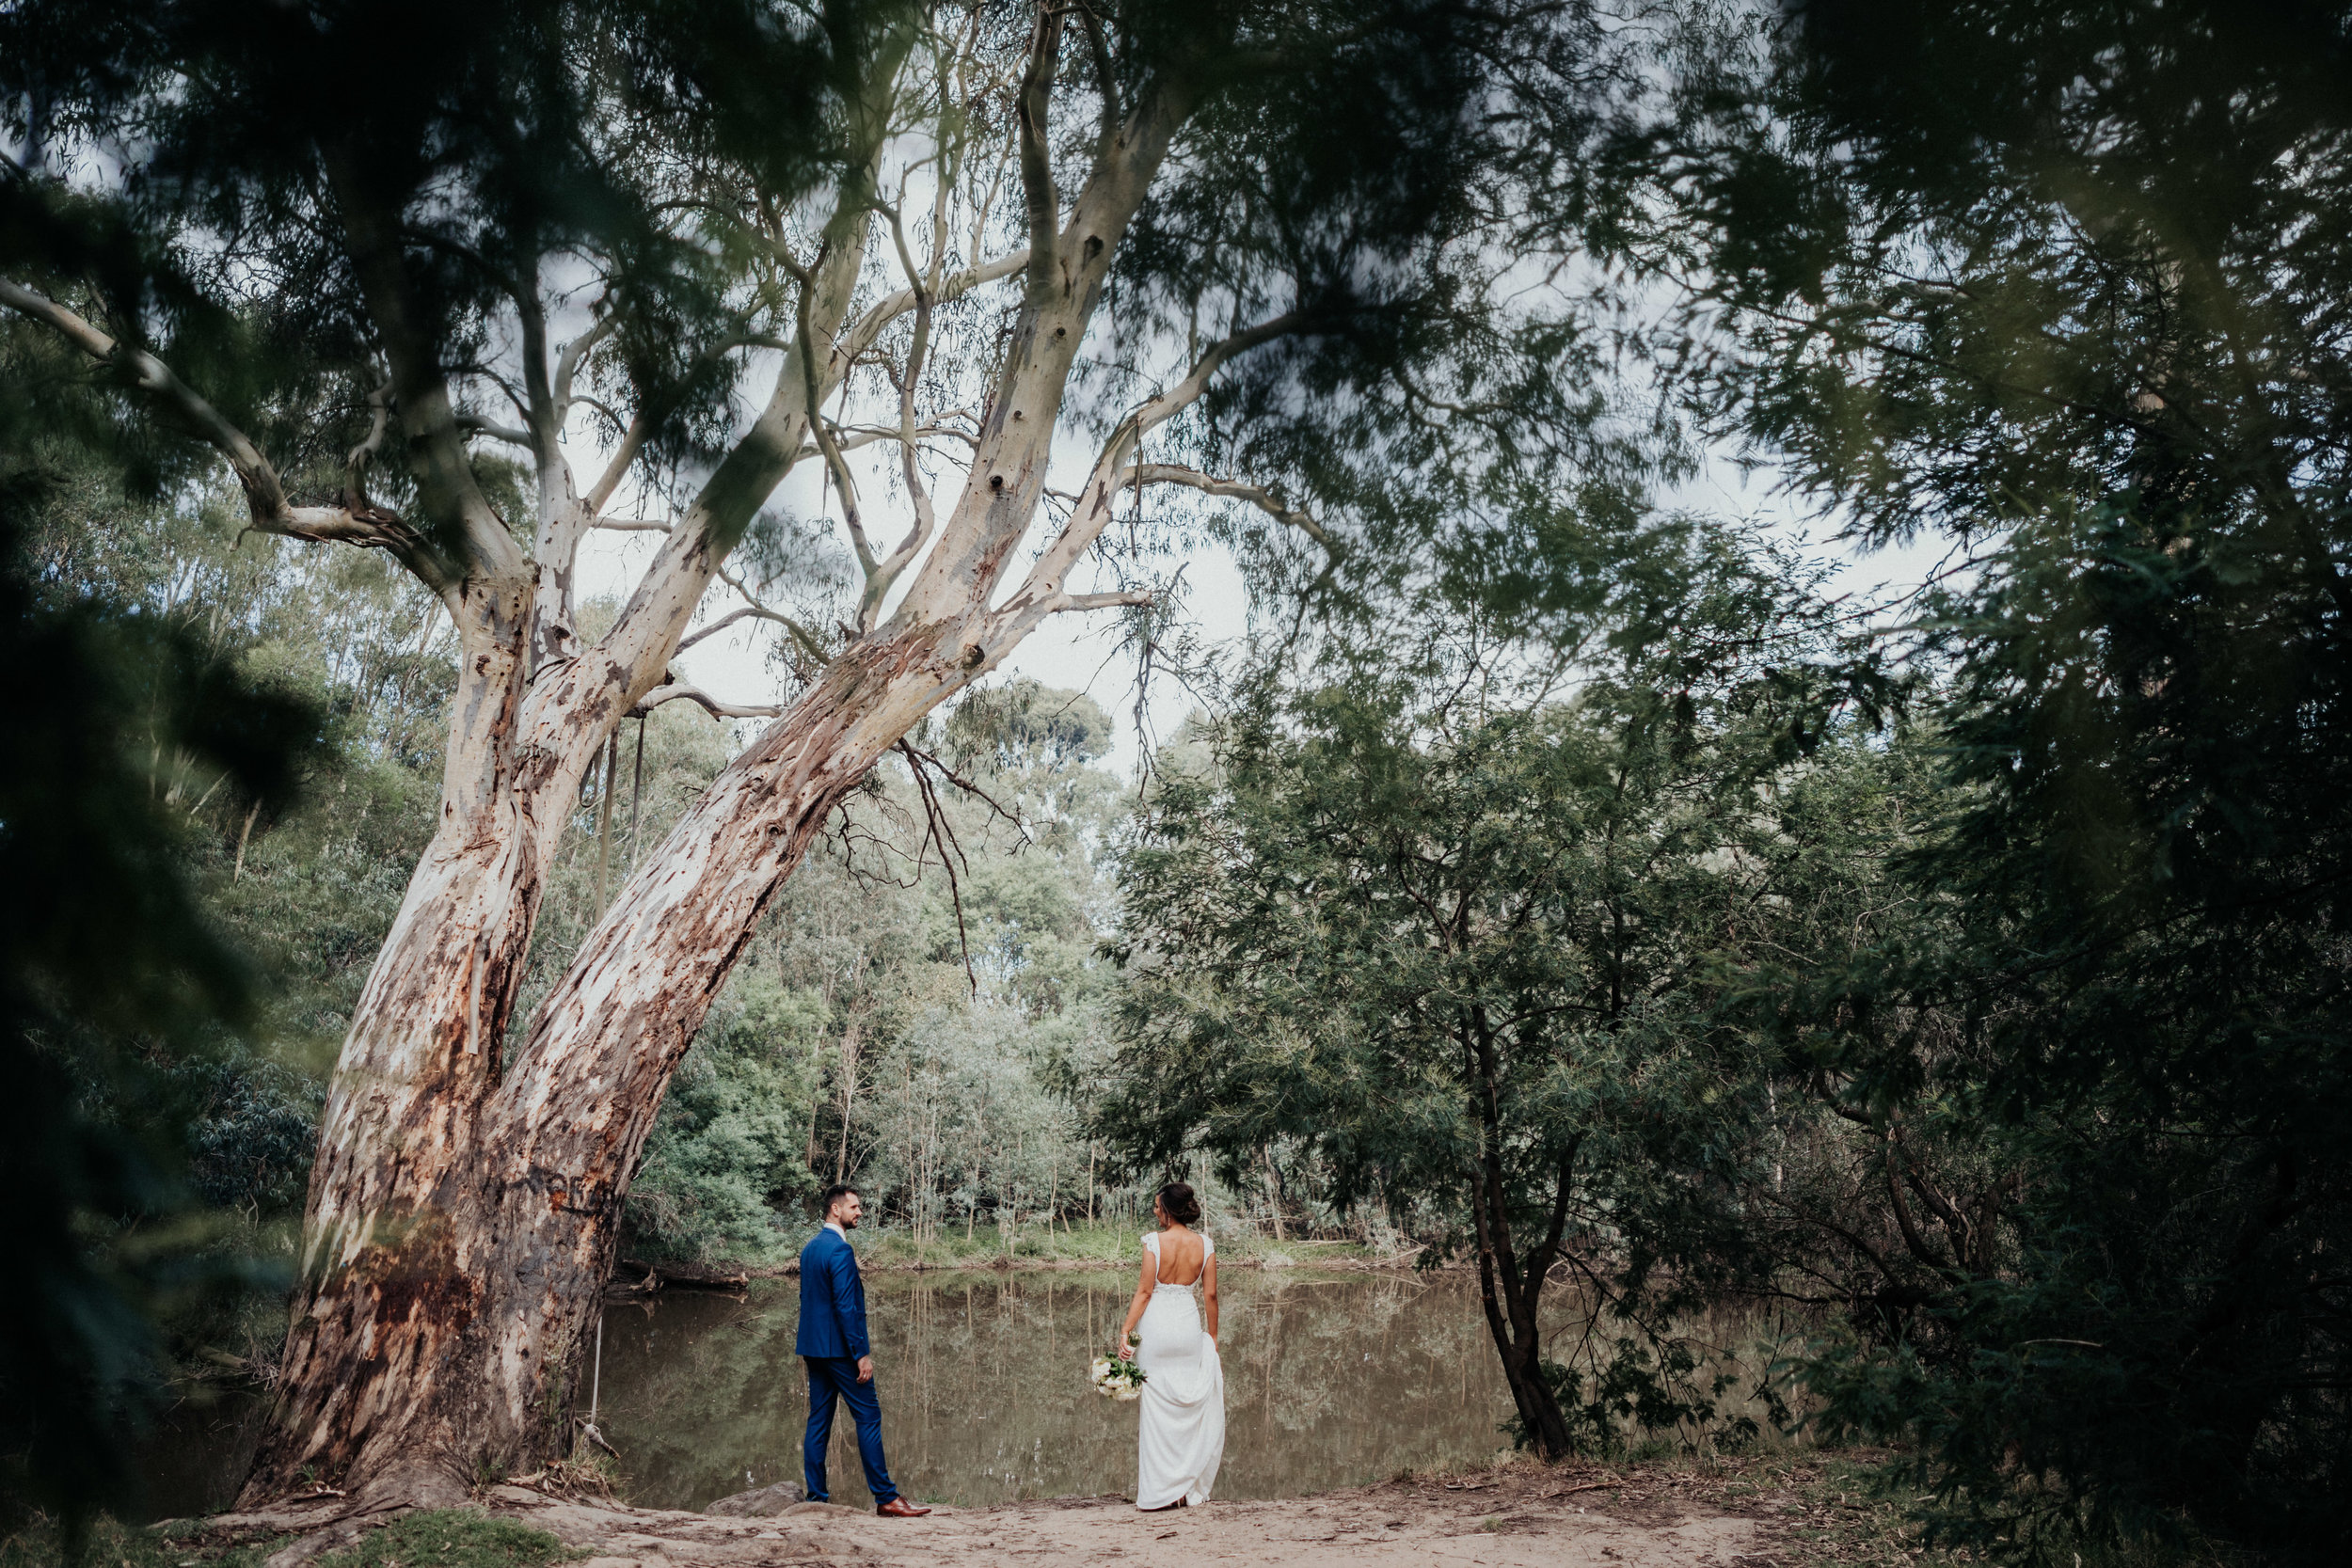 Aleksandra-Mladen-Wedding-Andy-438.jpg